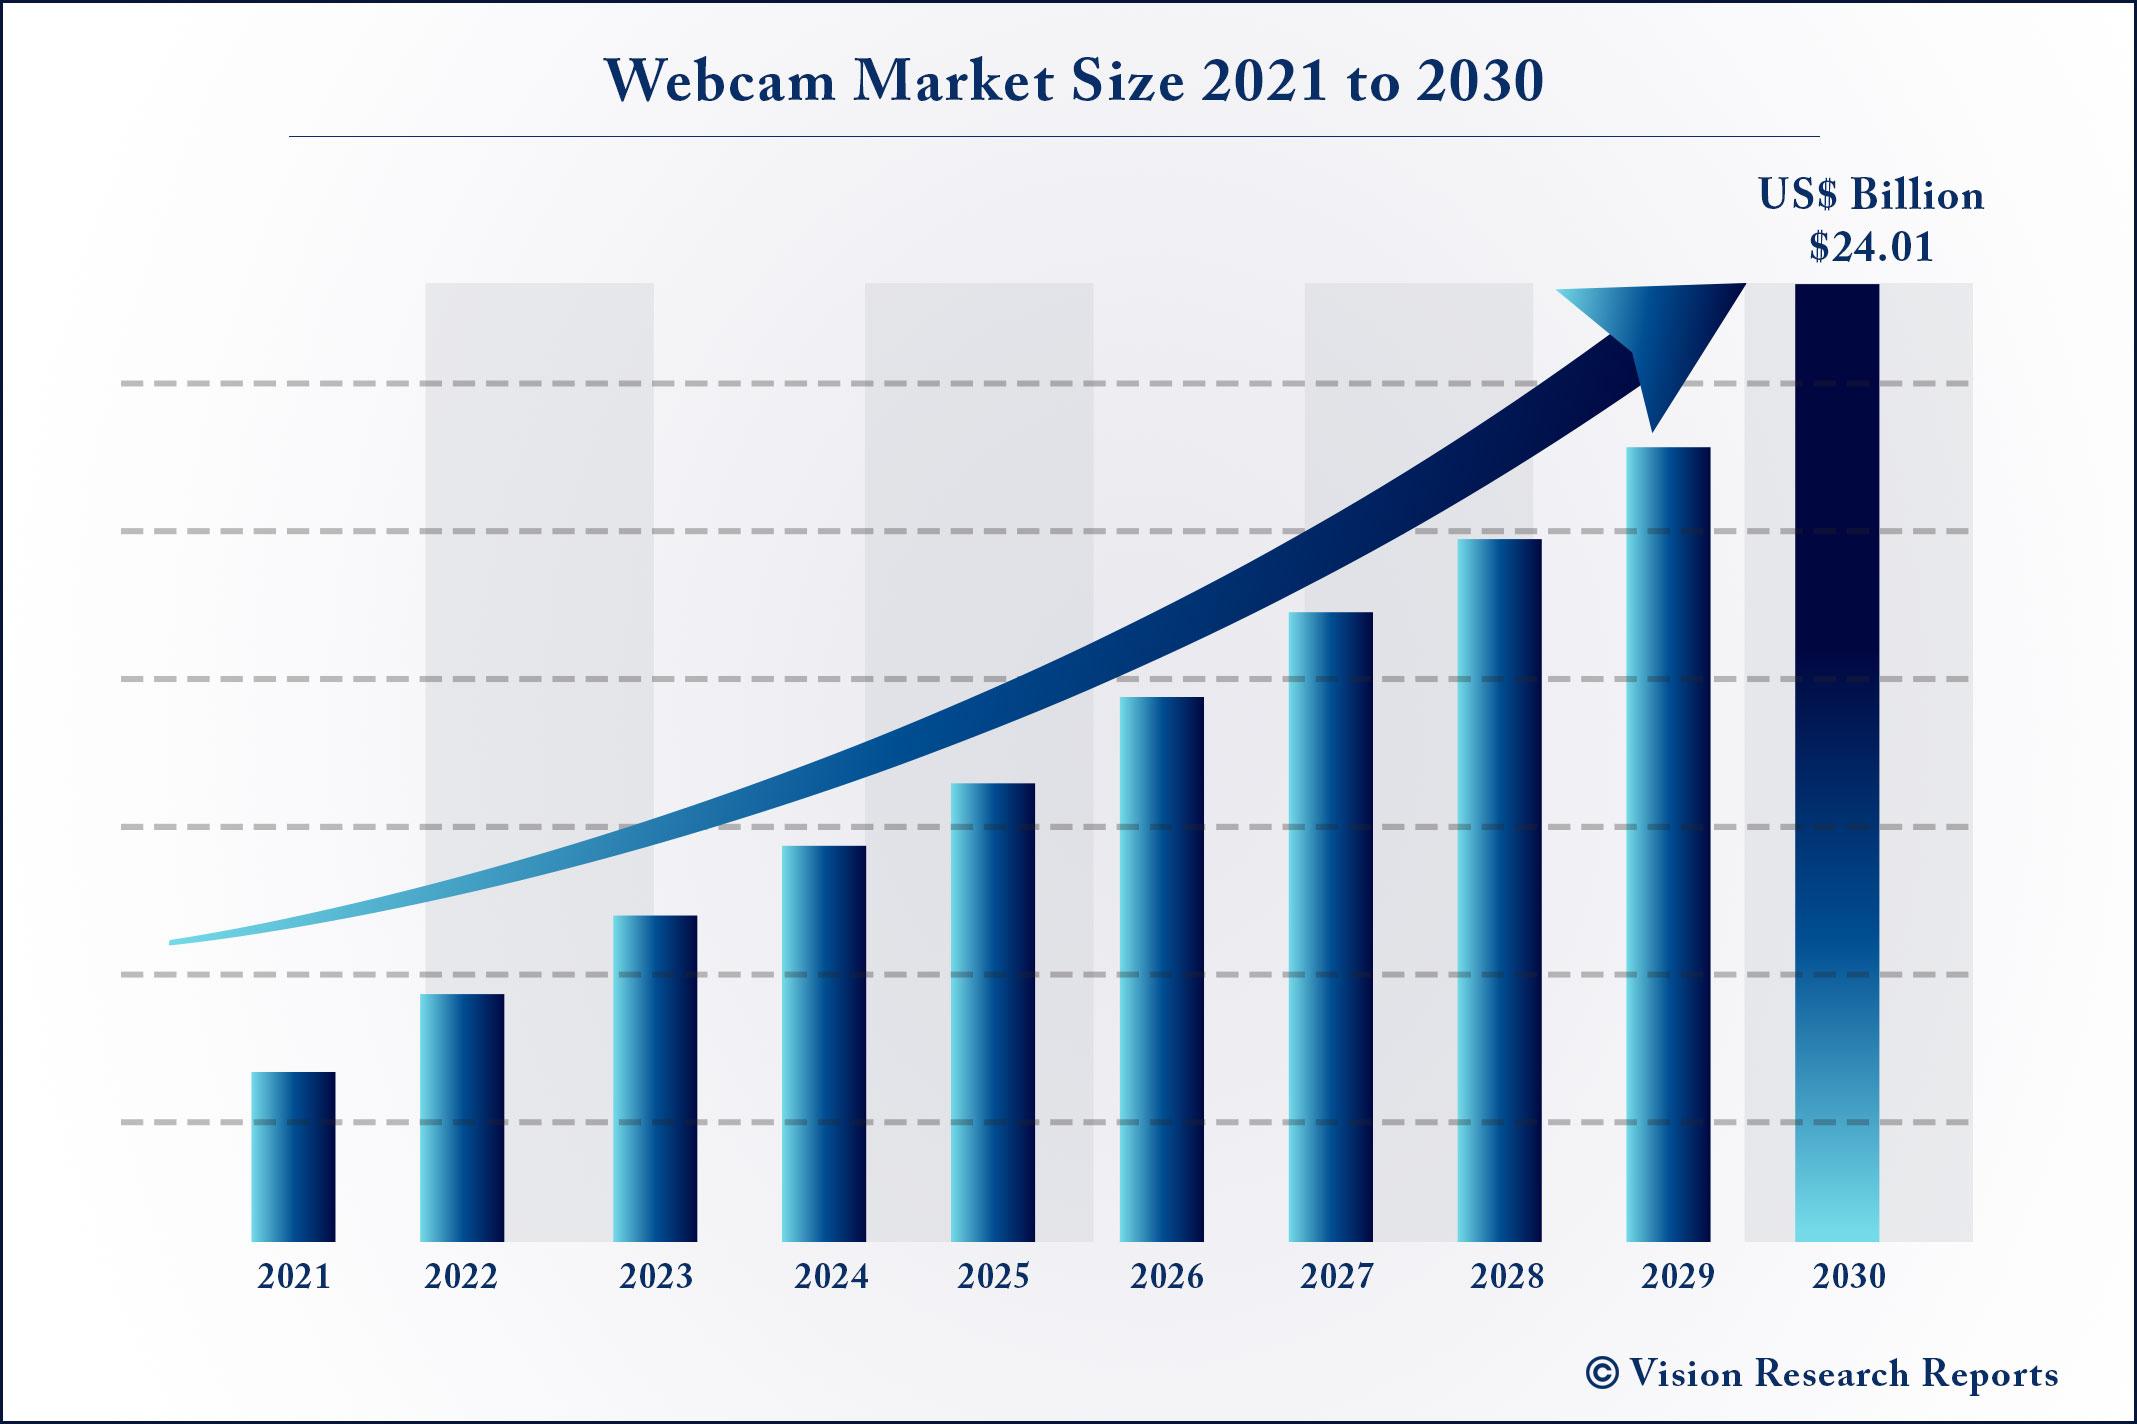 Webcam Market Size 2021 to 2030